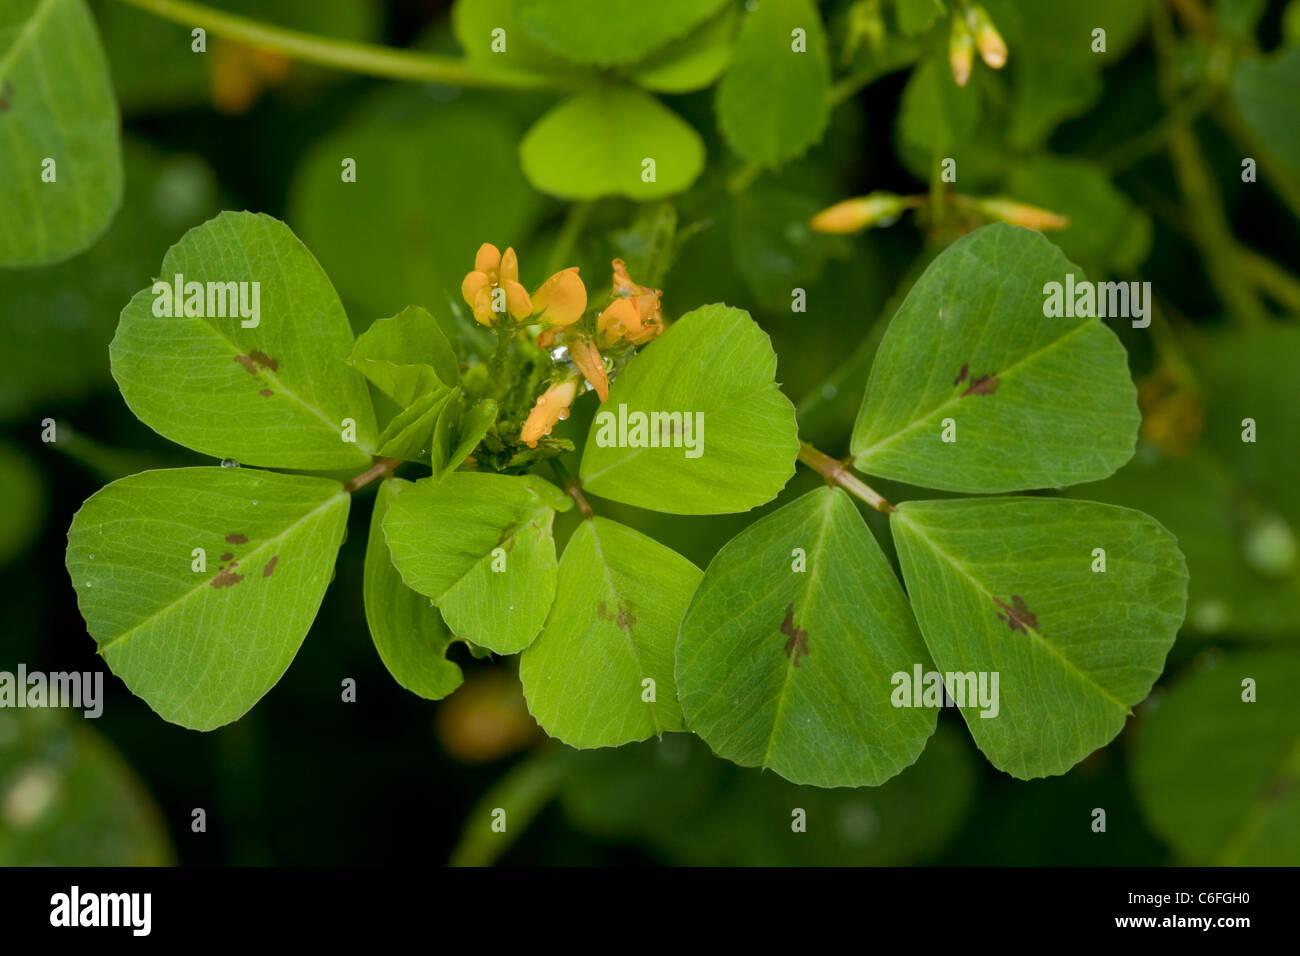 Spotted Medick, Medicago arabica in flower. - Stock Image